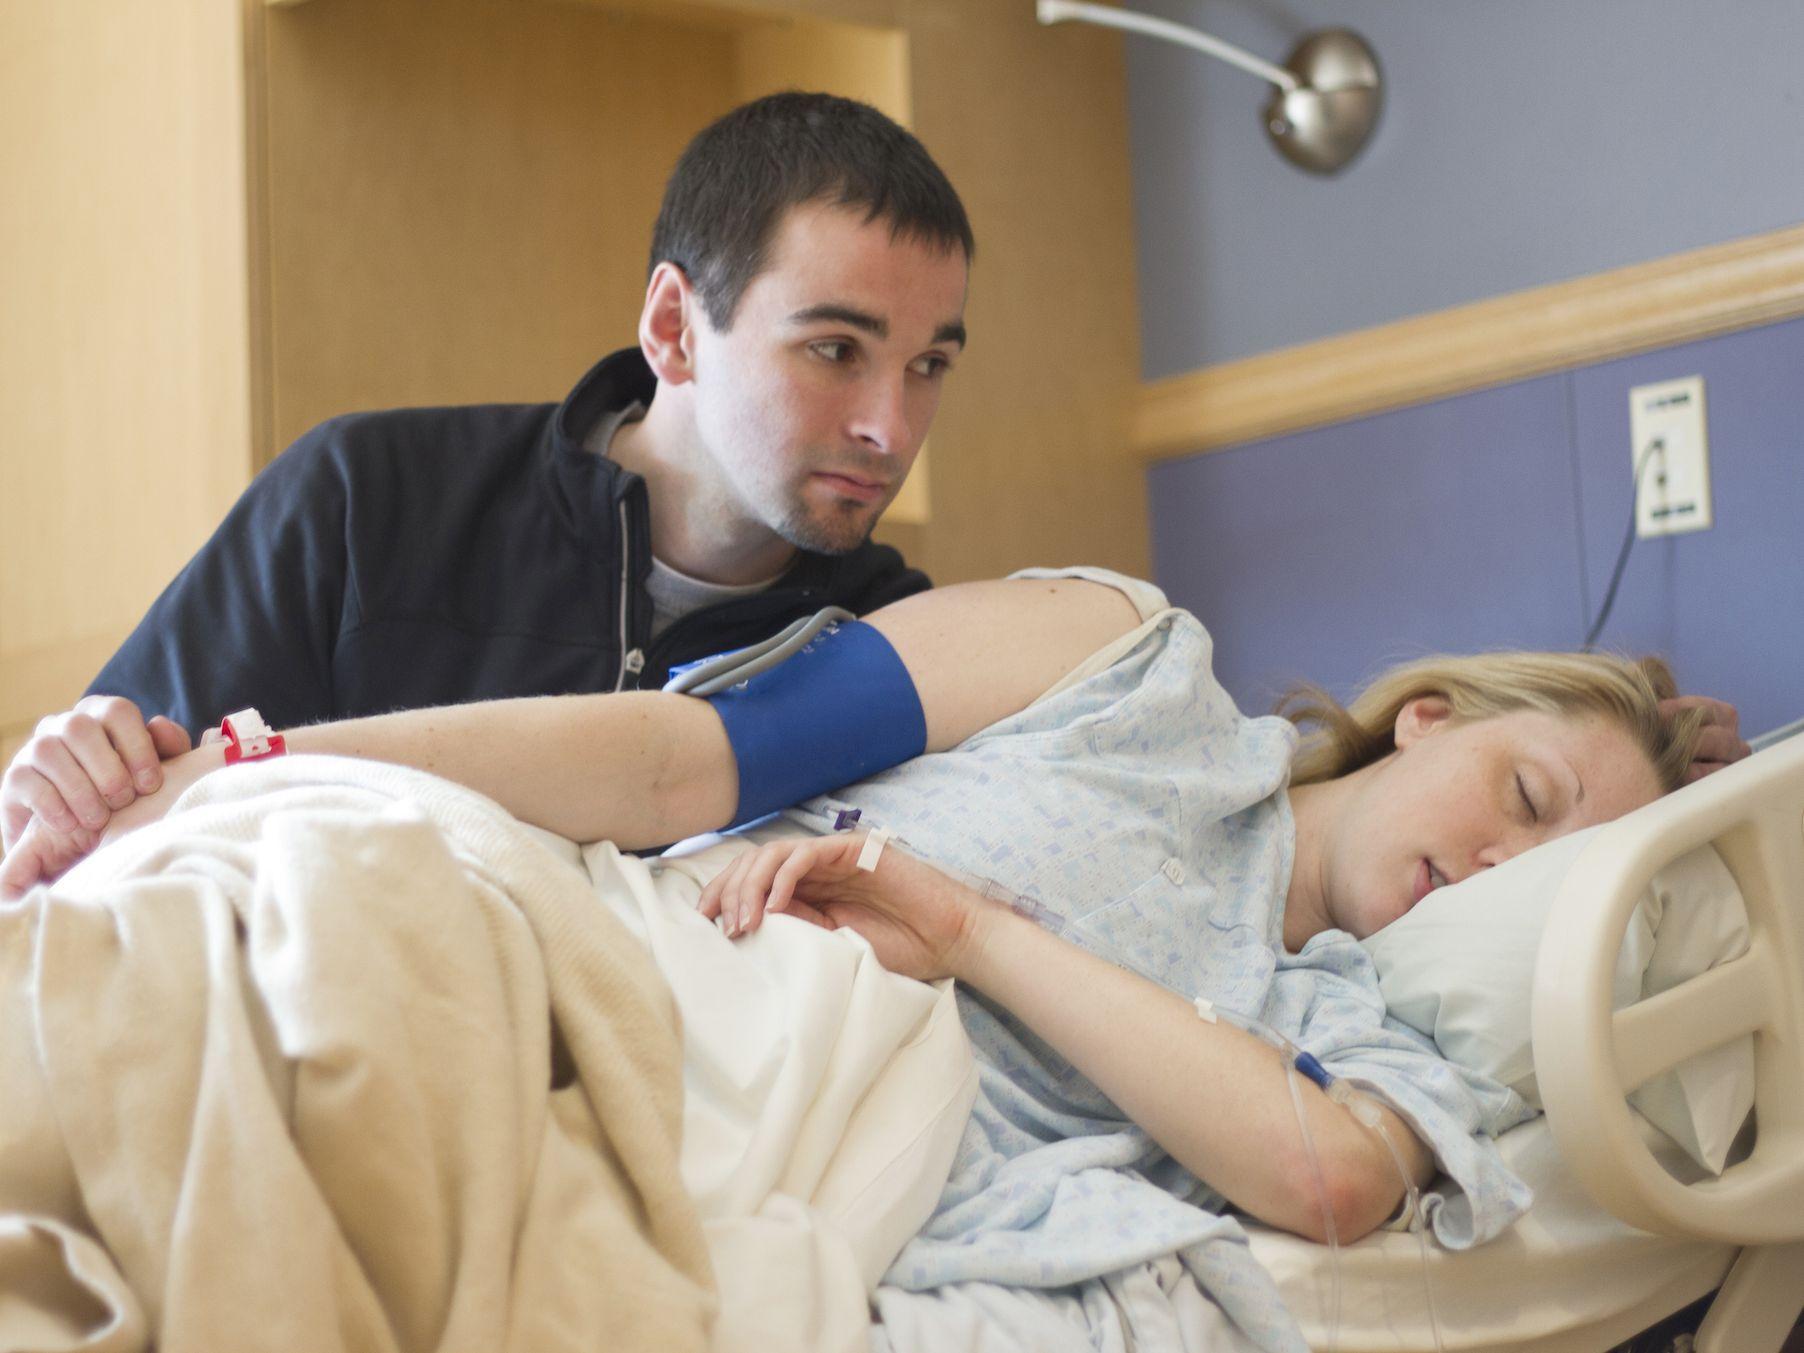 8 Things That Hurt More Than Childbirth